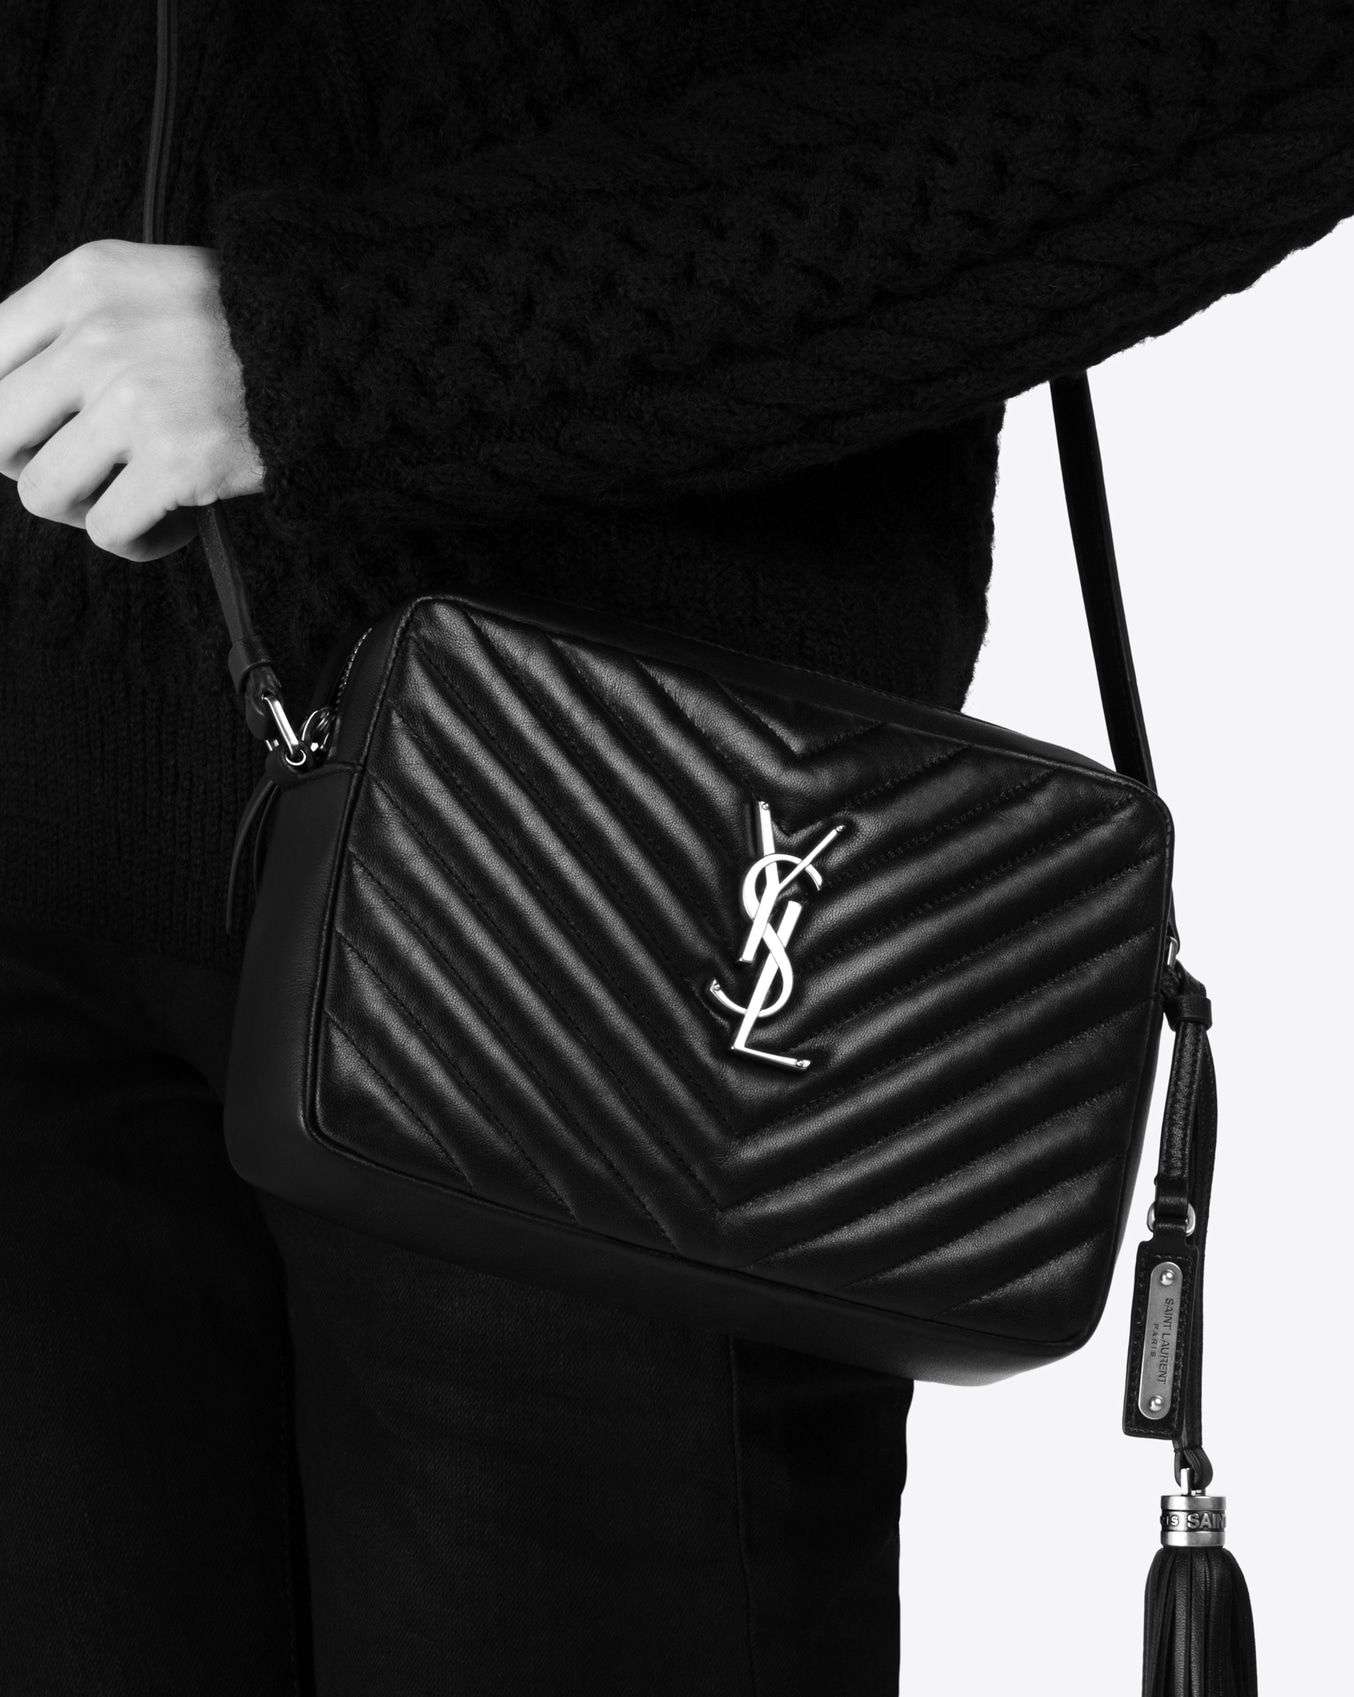 f70390d8f7b LOU camera bag in matelassé leather in 2019 | Bags & Adornment ...